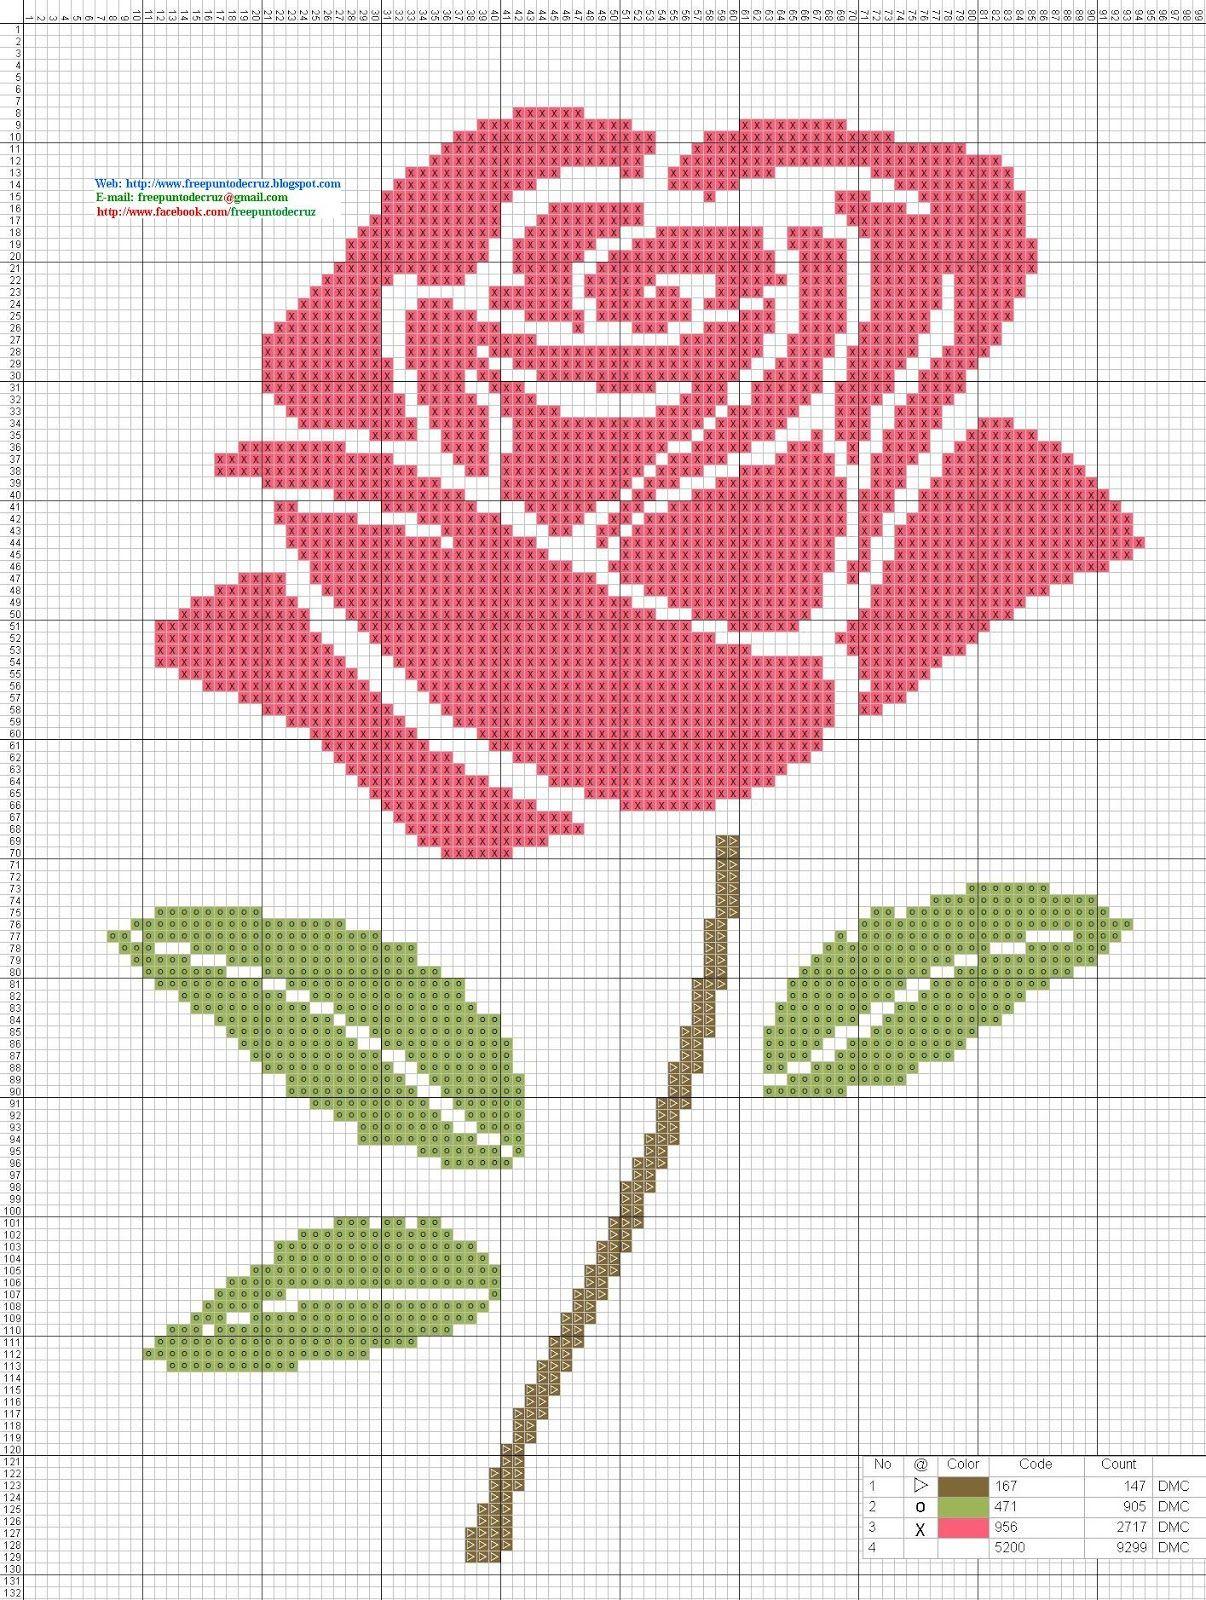 Rosa_Pink_-_Punto_de_cruz.jpg   Вышивка \\ Stitching   Pinterest ...